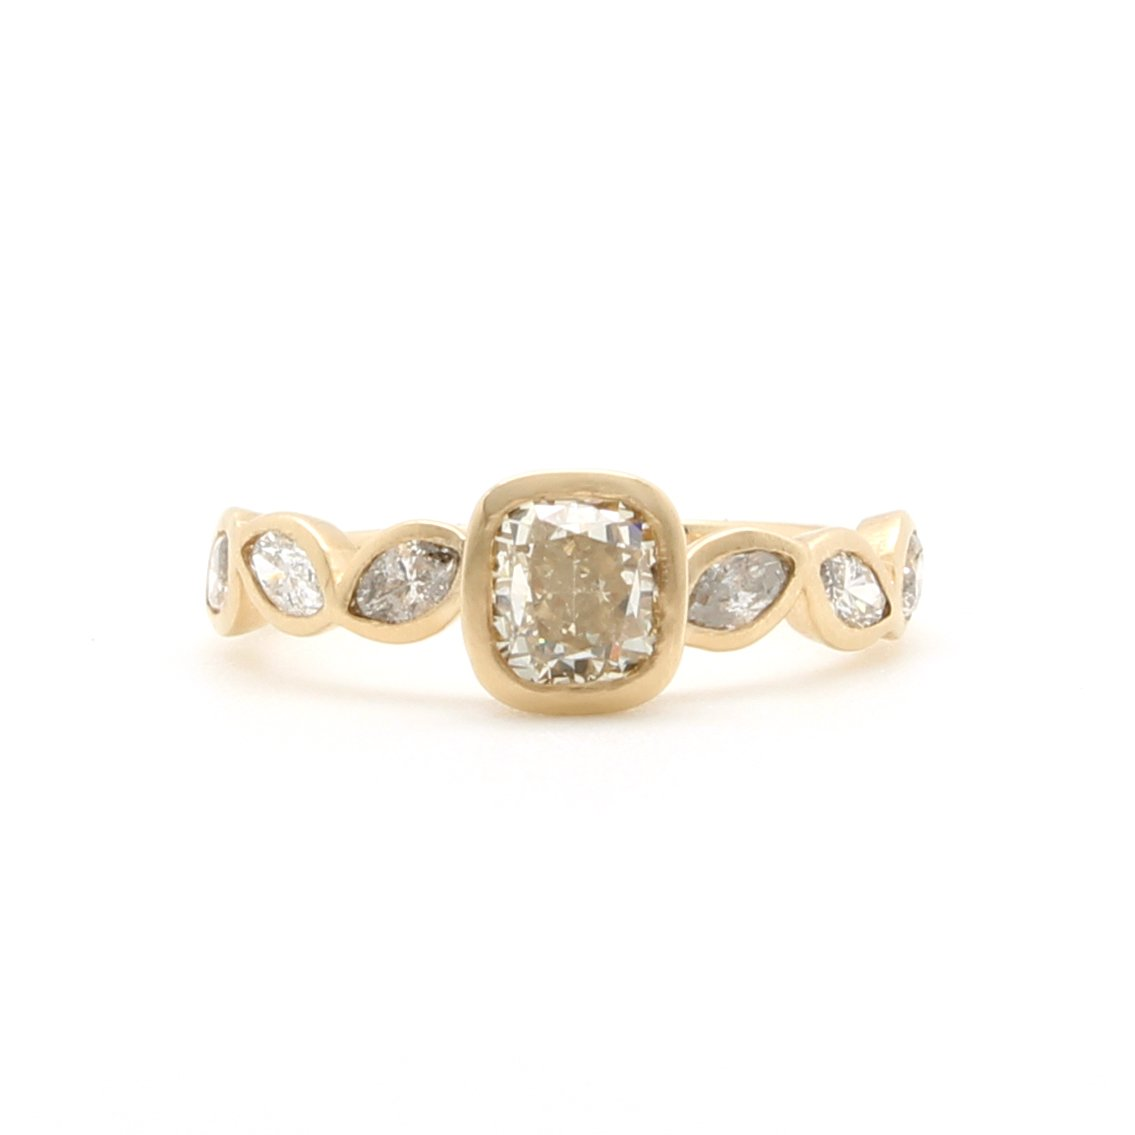 Earth Friendly Jewelry Rings